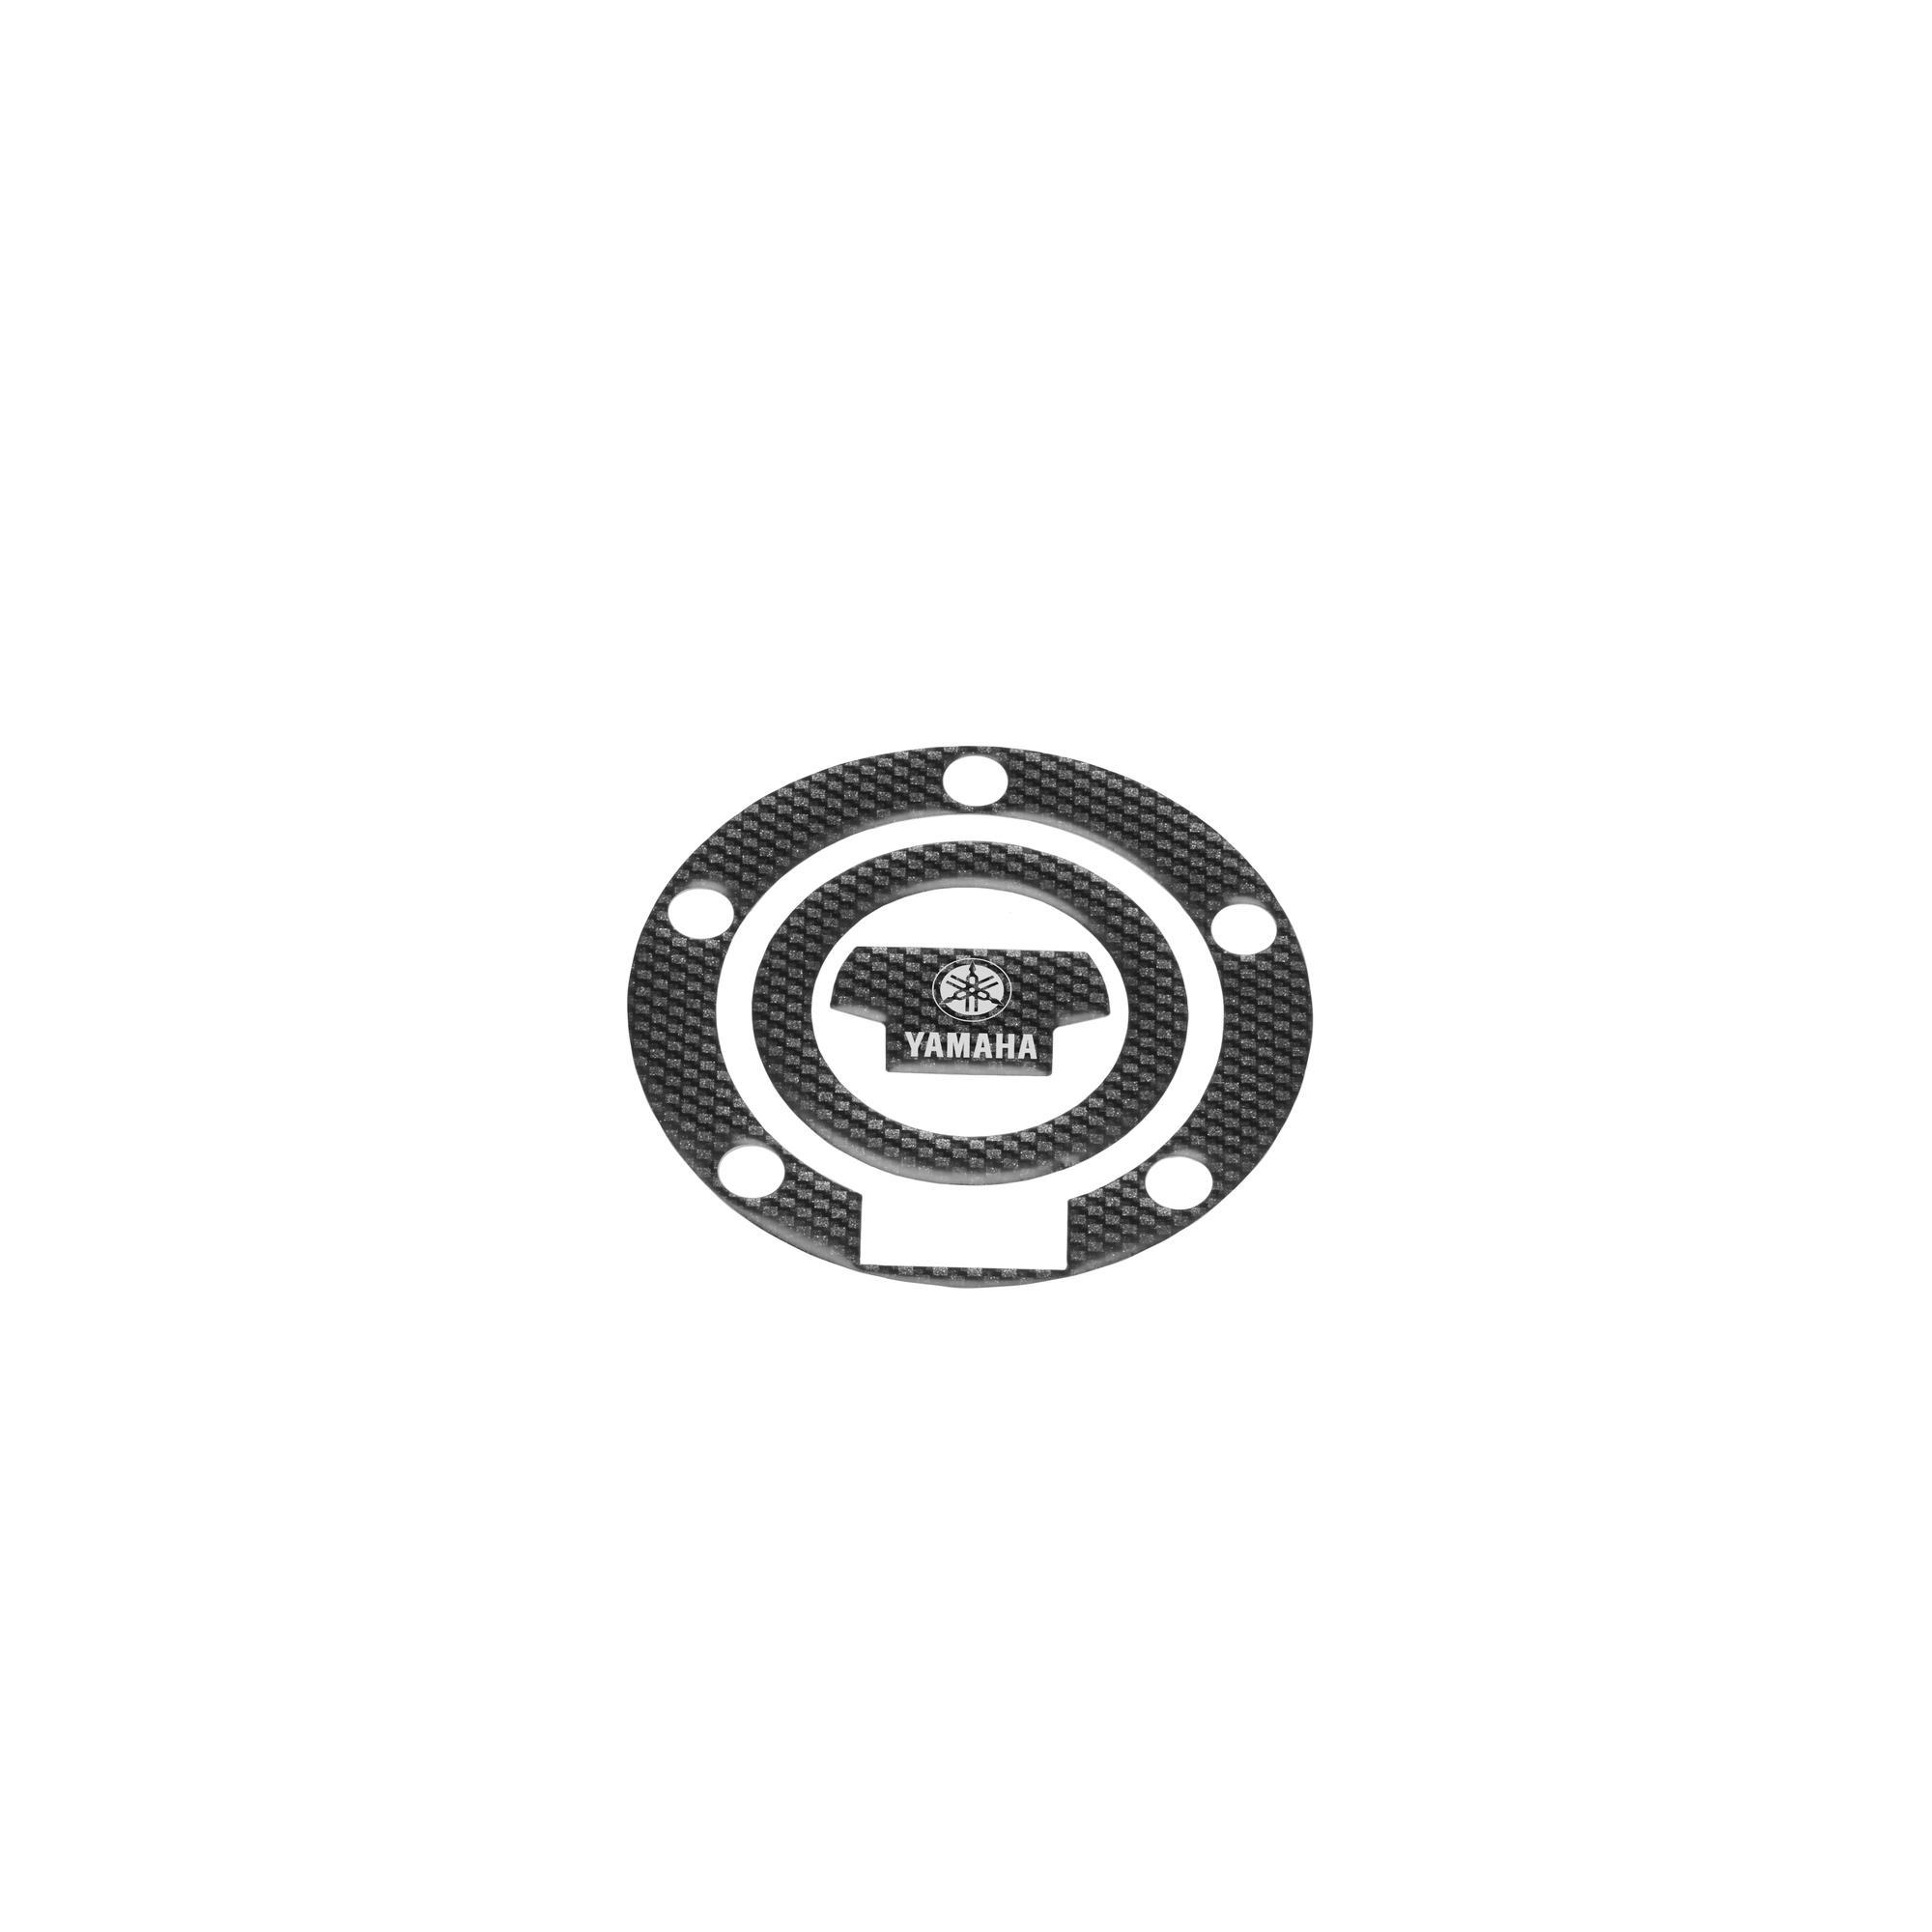 PAD-PROTECTION-BOUCHON-RESERVOIR-R6-2017